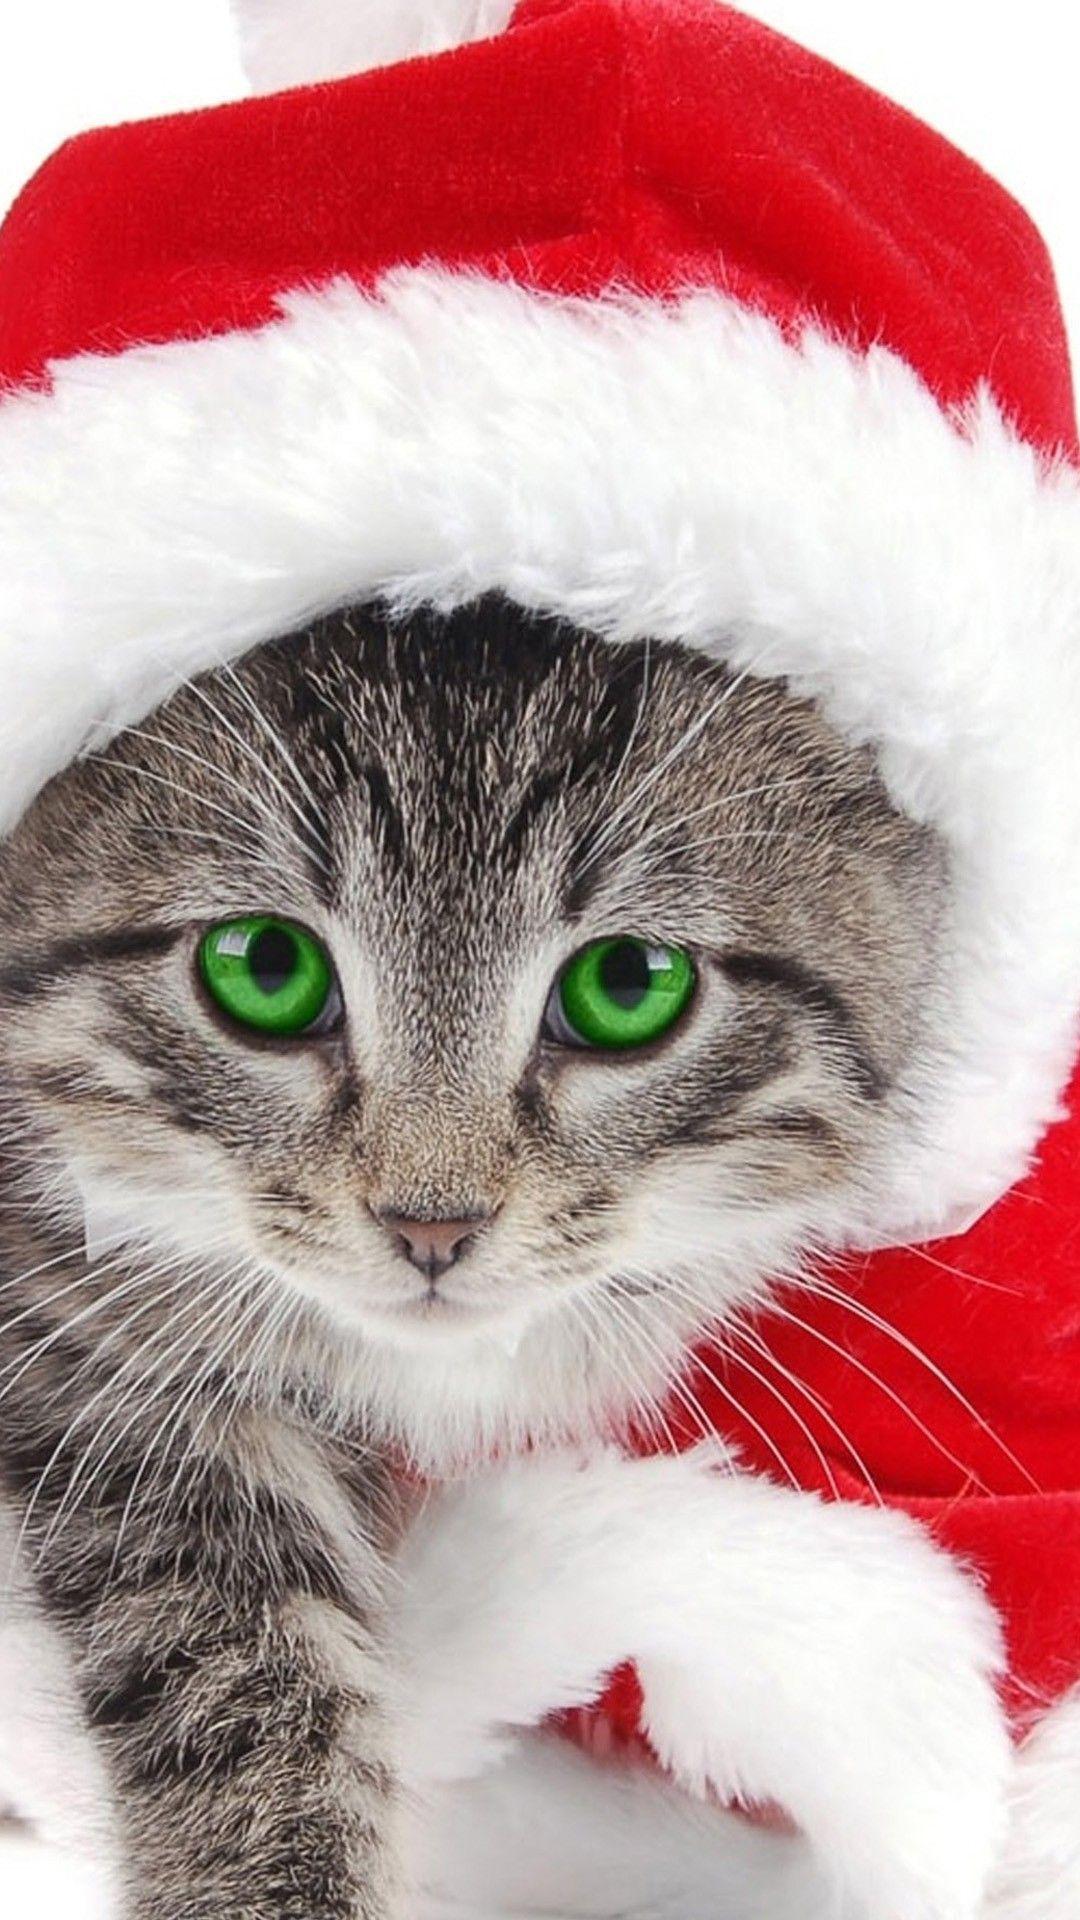 200+ Free Christmas Cat & Cat Images - Pixabay